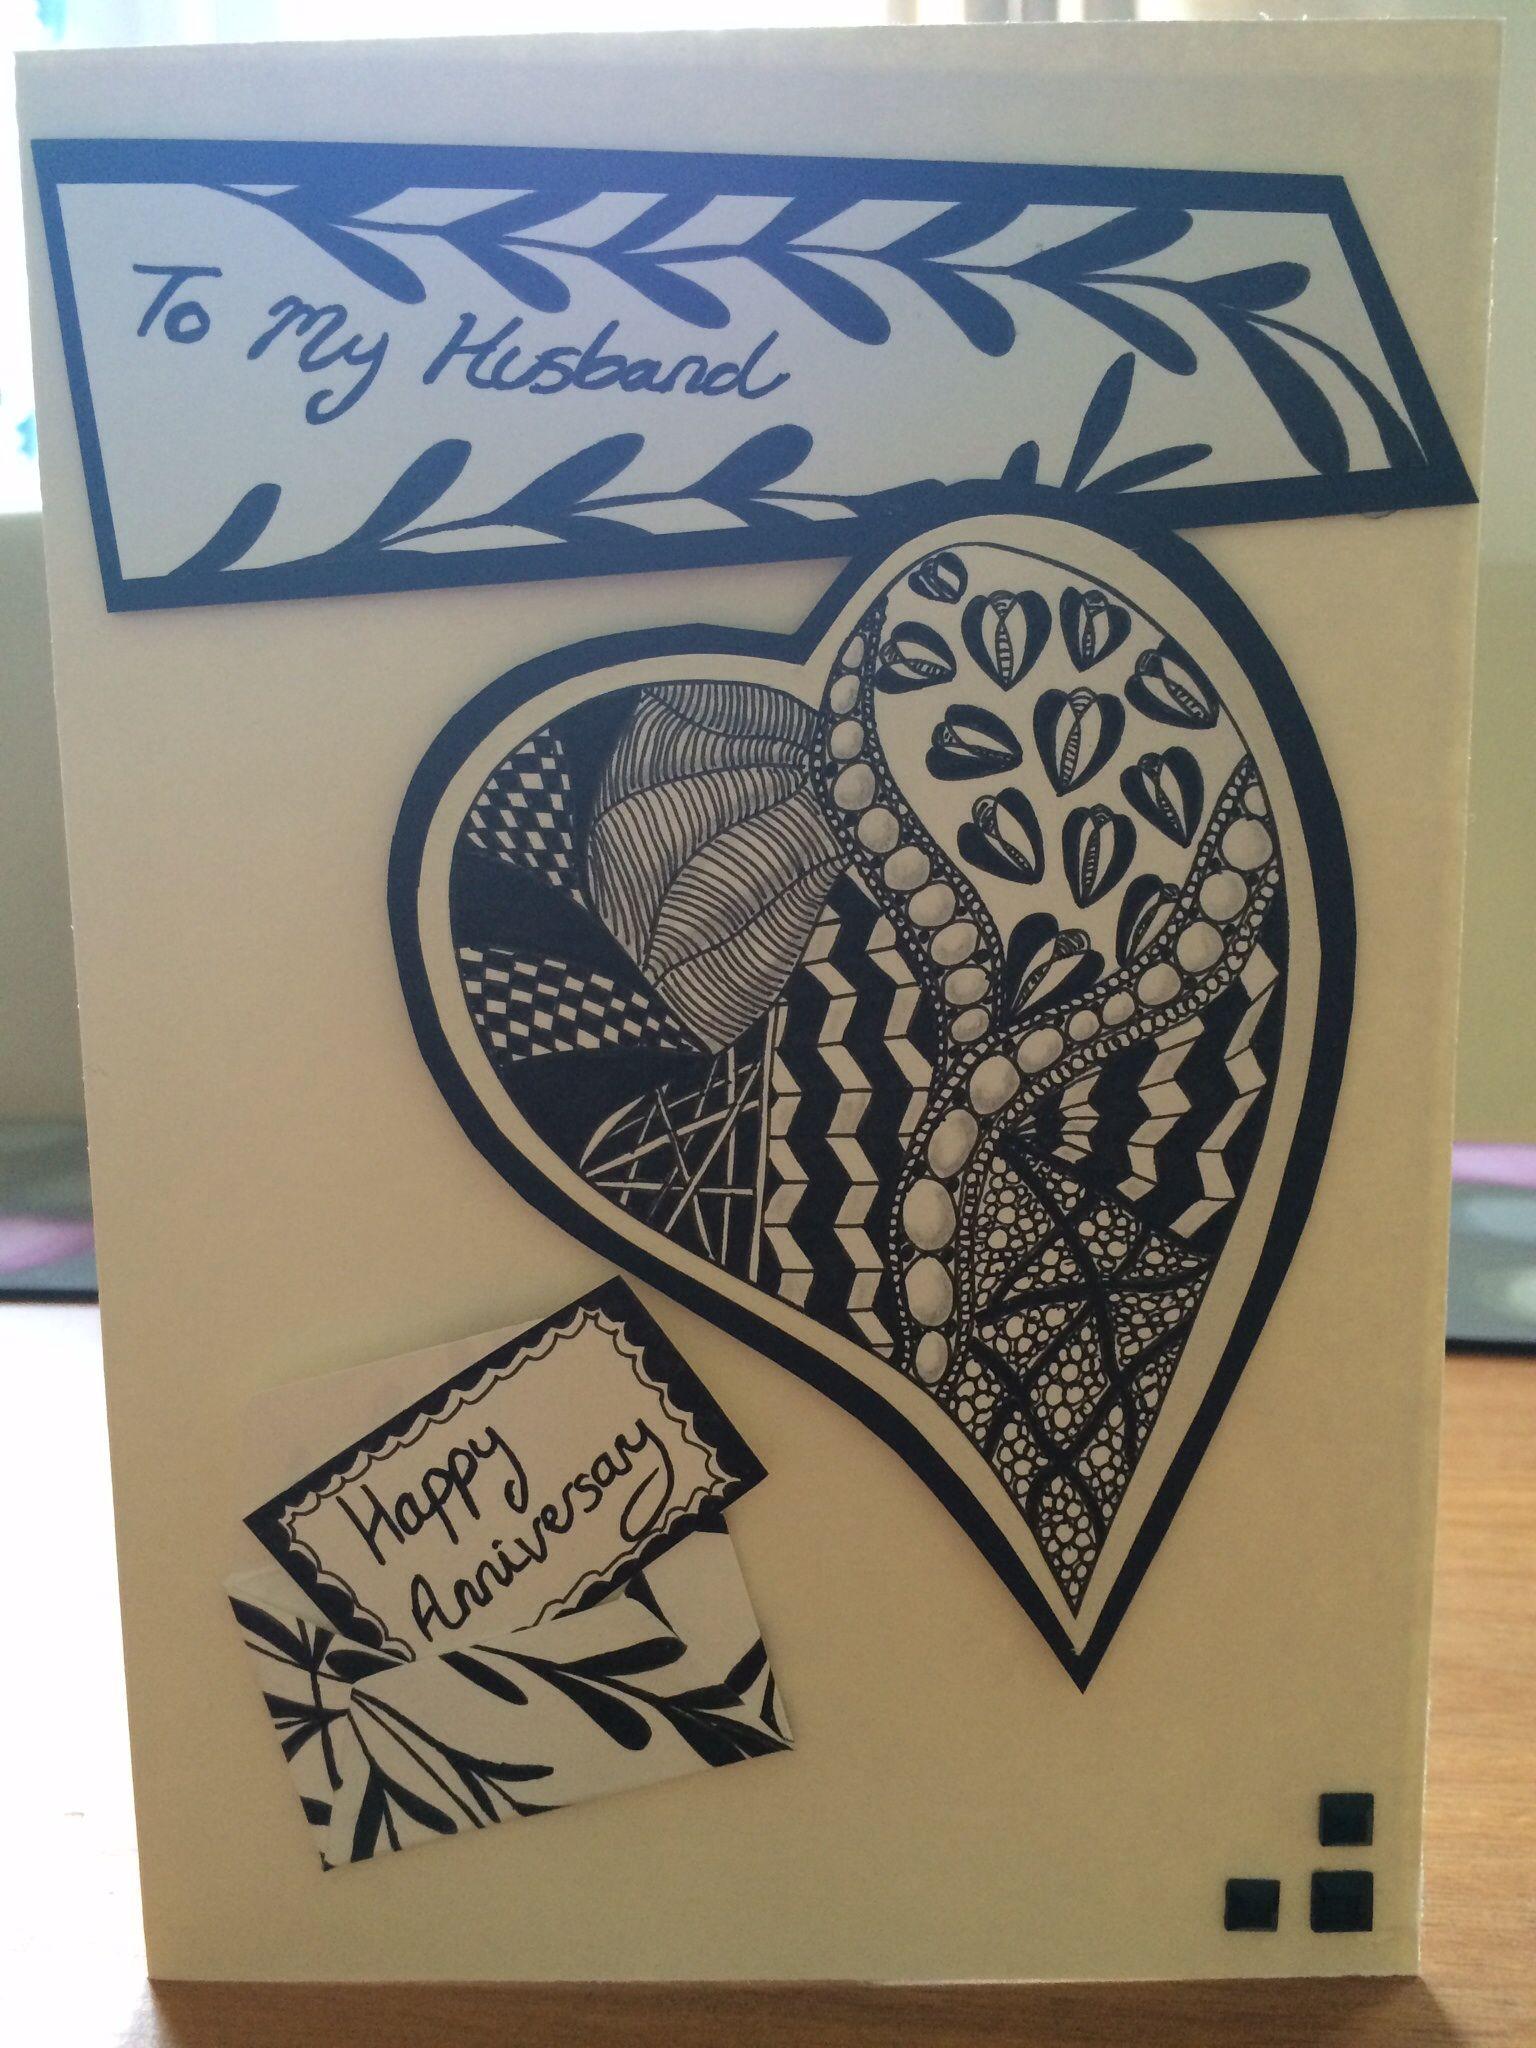 Kio Cards Hand Drawn Love Arrow Anniversary Card Love Cupid Arrow Anniversary Cards Handmade Valentine Cards Handmade Homemade Anniversary Cards